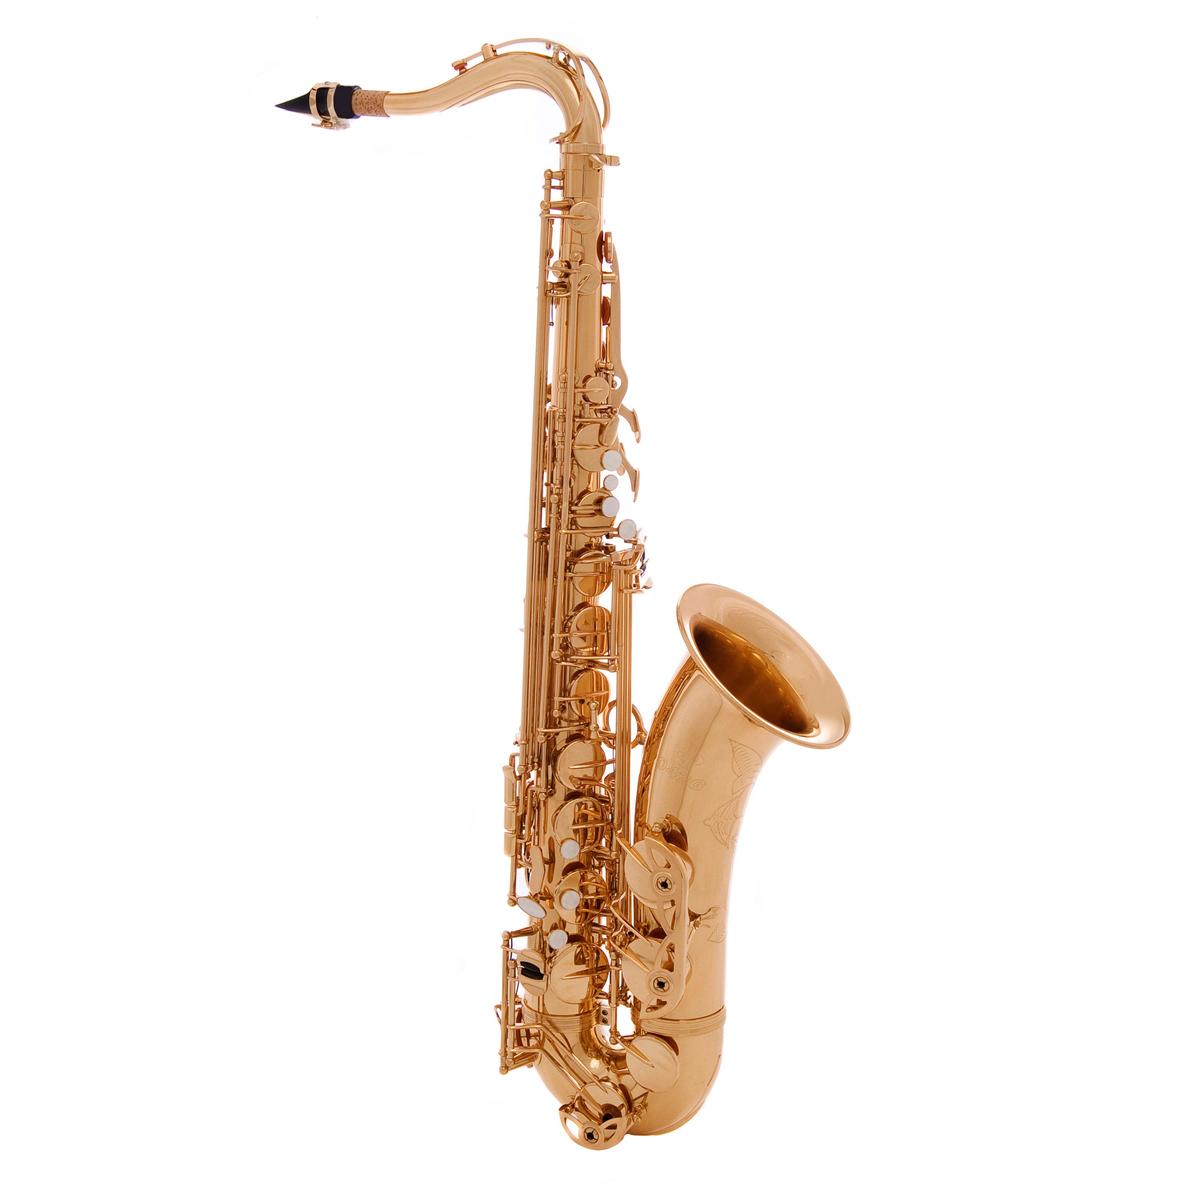 John Packer Tenor Saxofoon JP042G - Uitvoering: Verguld